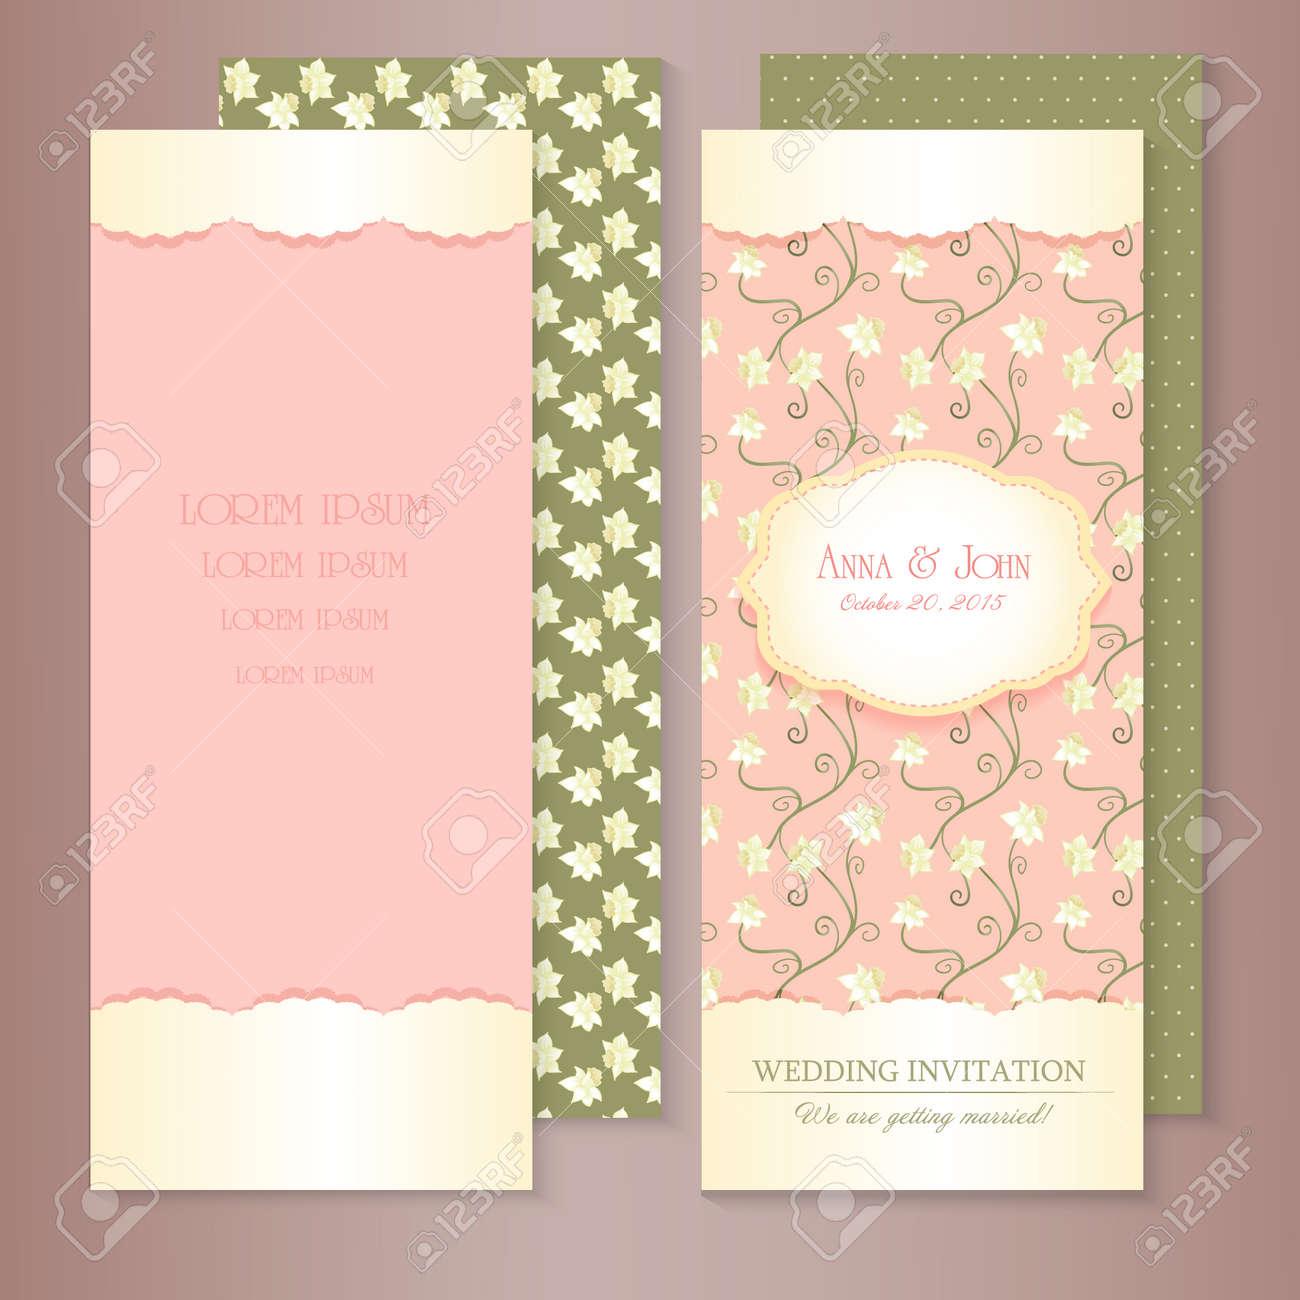 Marriage Invitation Card Set Vector Illustration Floral Save